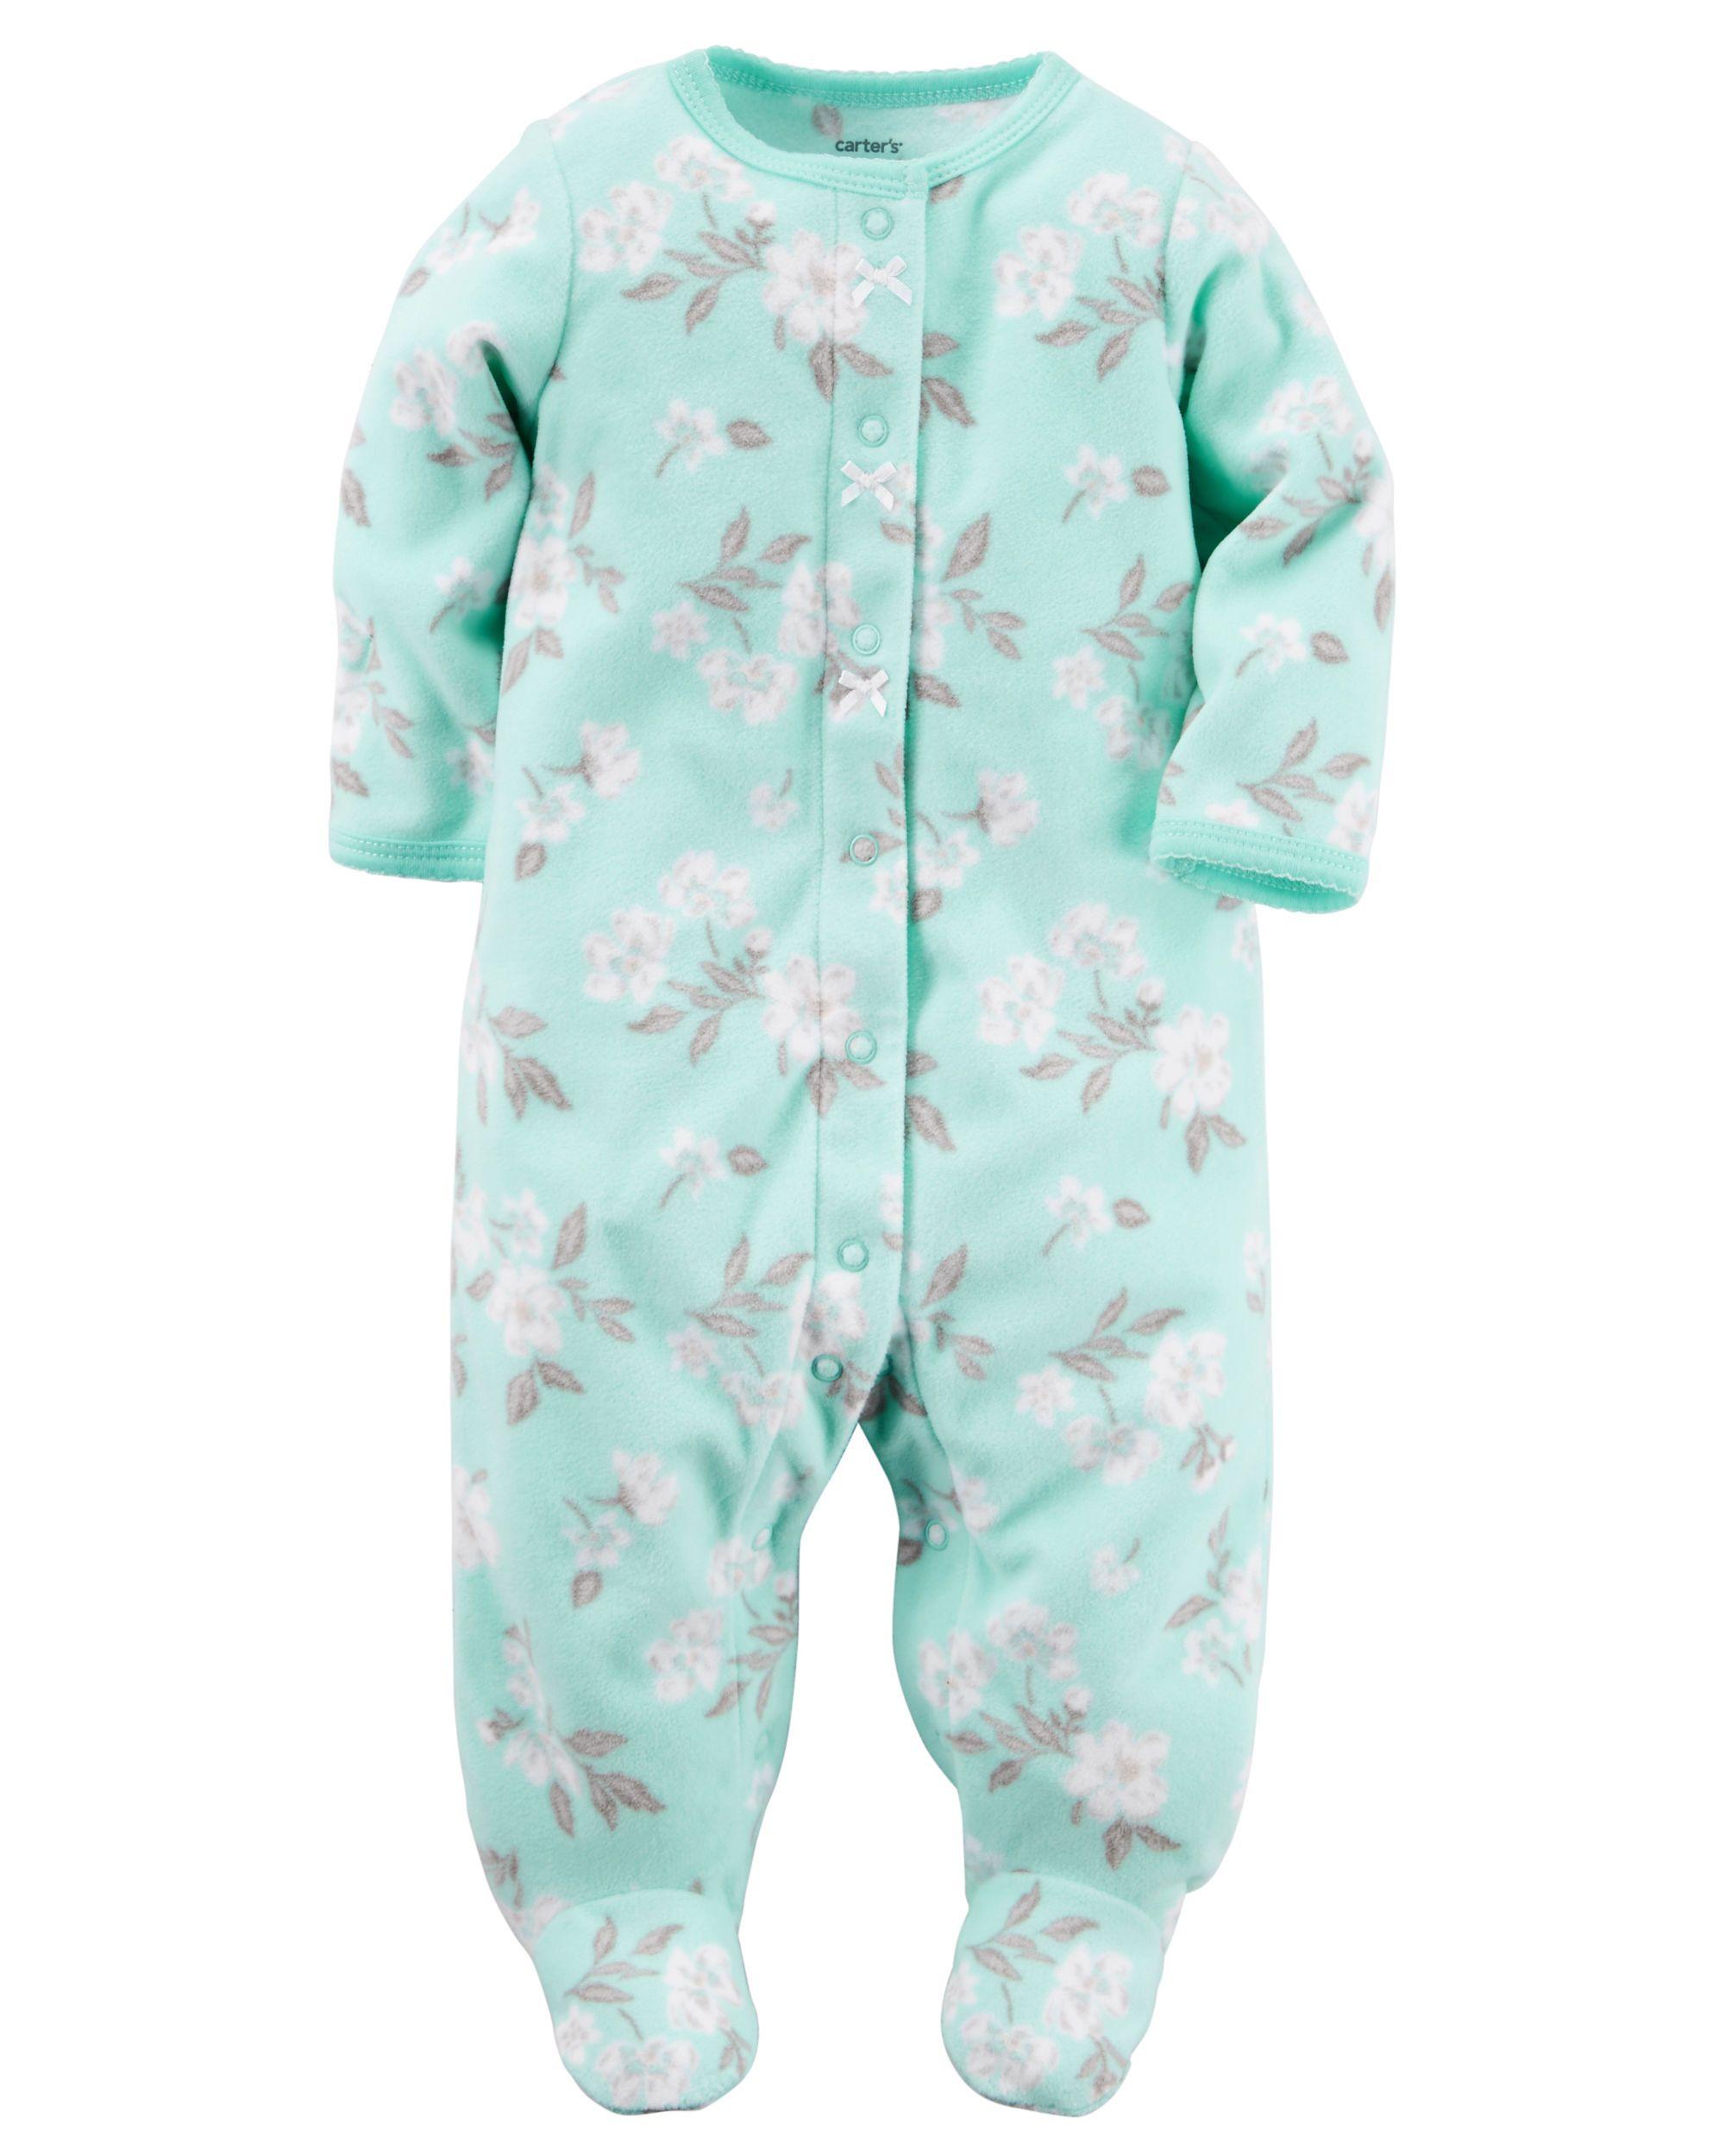 24ee989a1 Baby Girl Fleece Snap-Up Sleep   Play from Carters.com. Shop ...